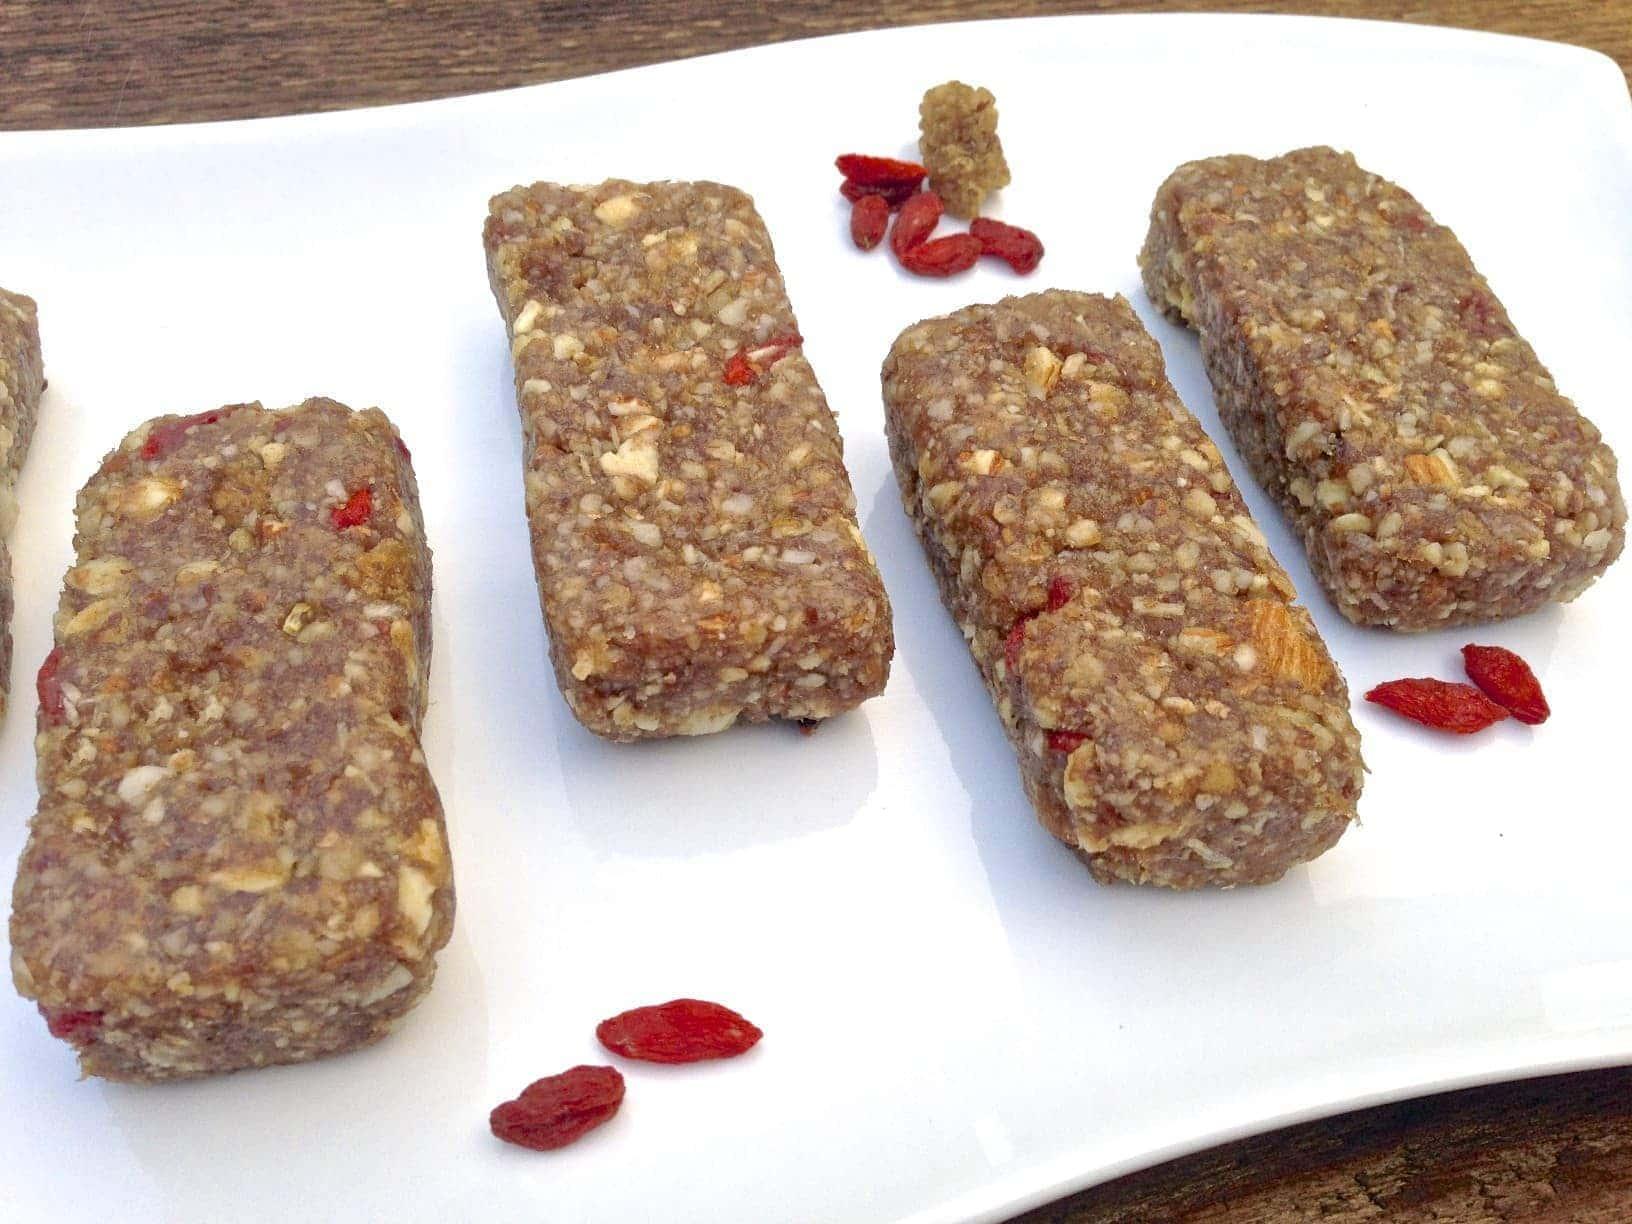 Mulberry & Goji Berry Energy Bars